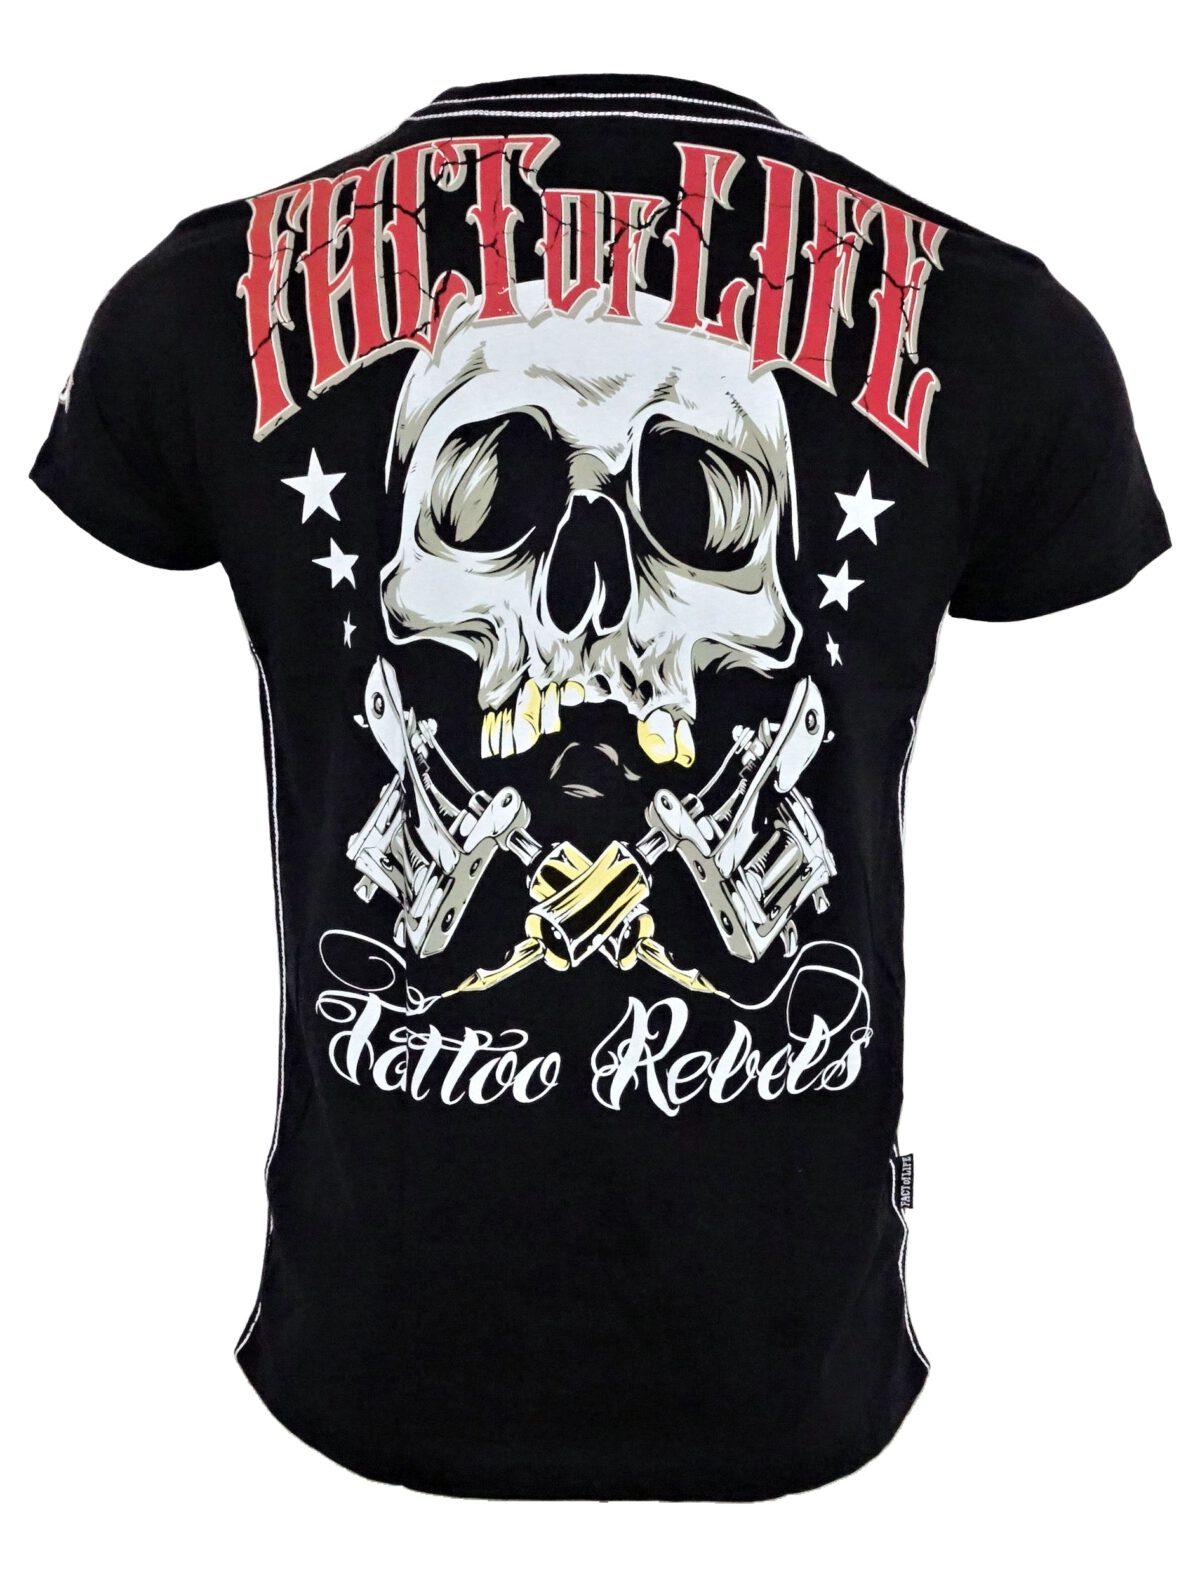 Fact of Life T-Shirt TS-32 Tattoo Rebels black.